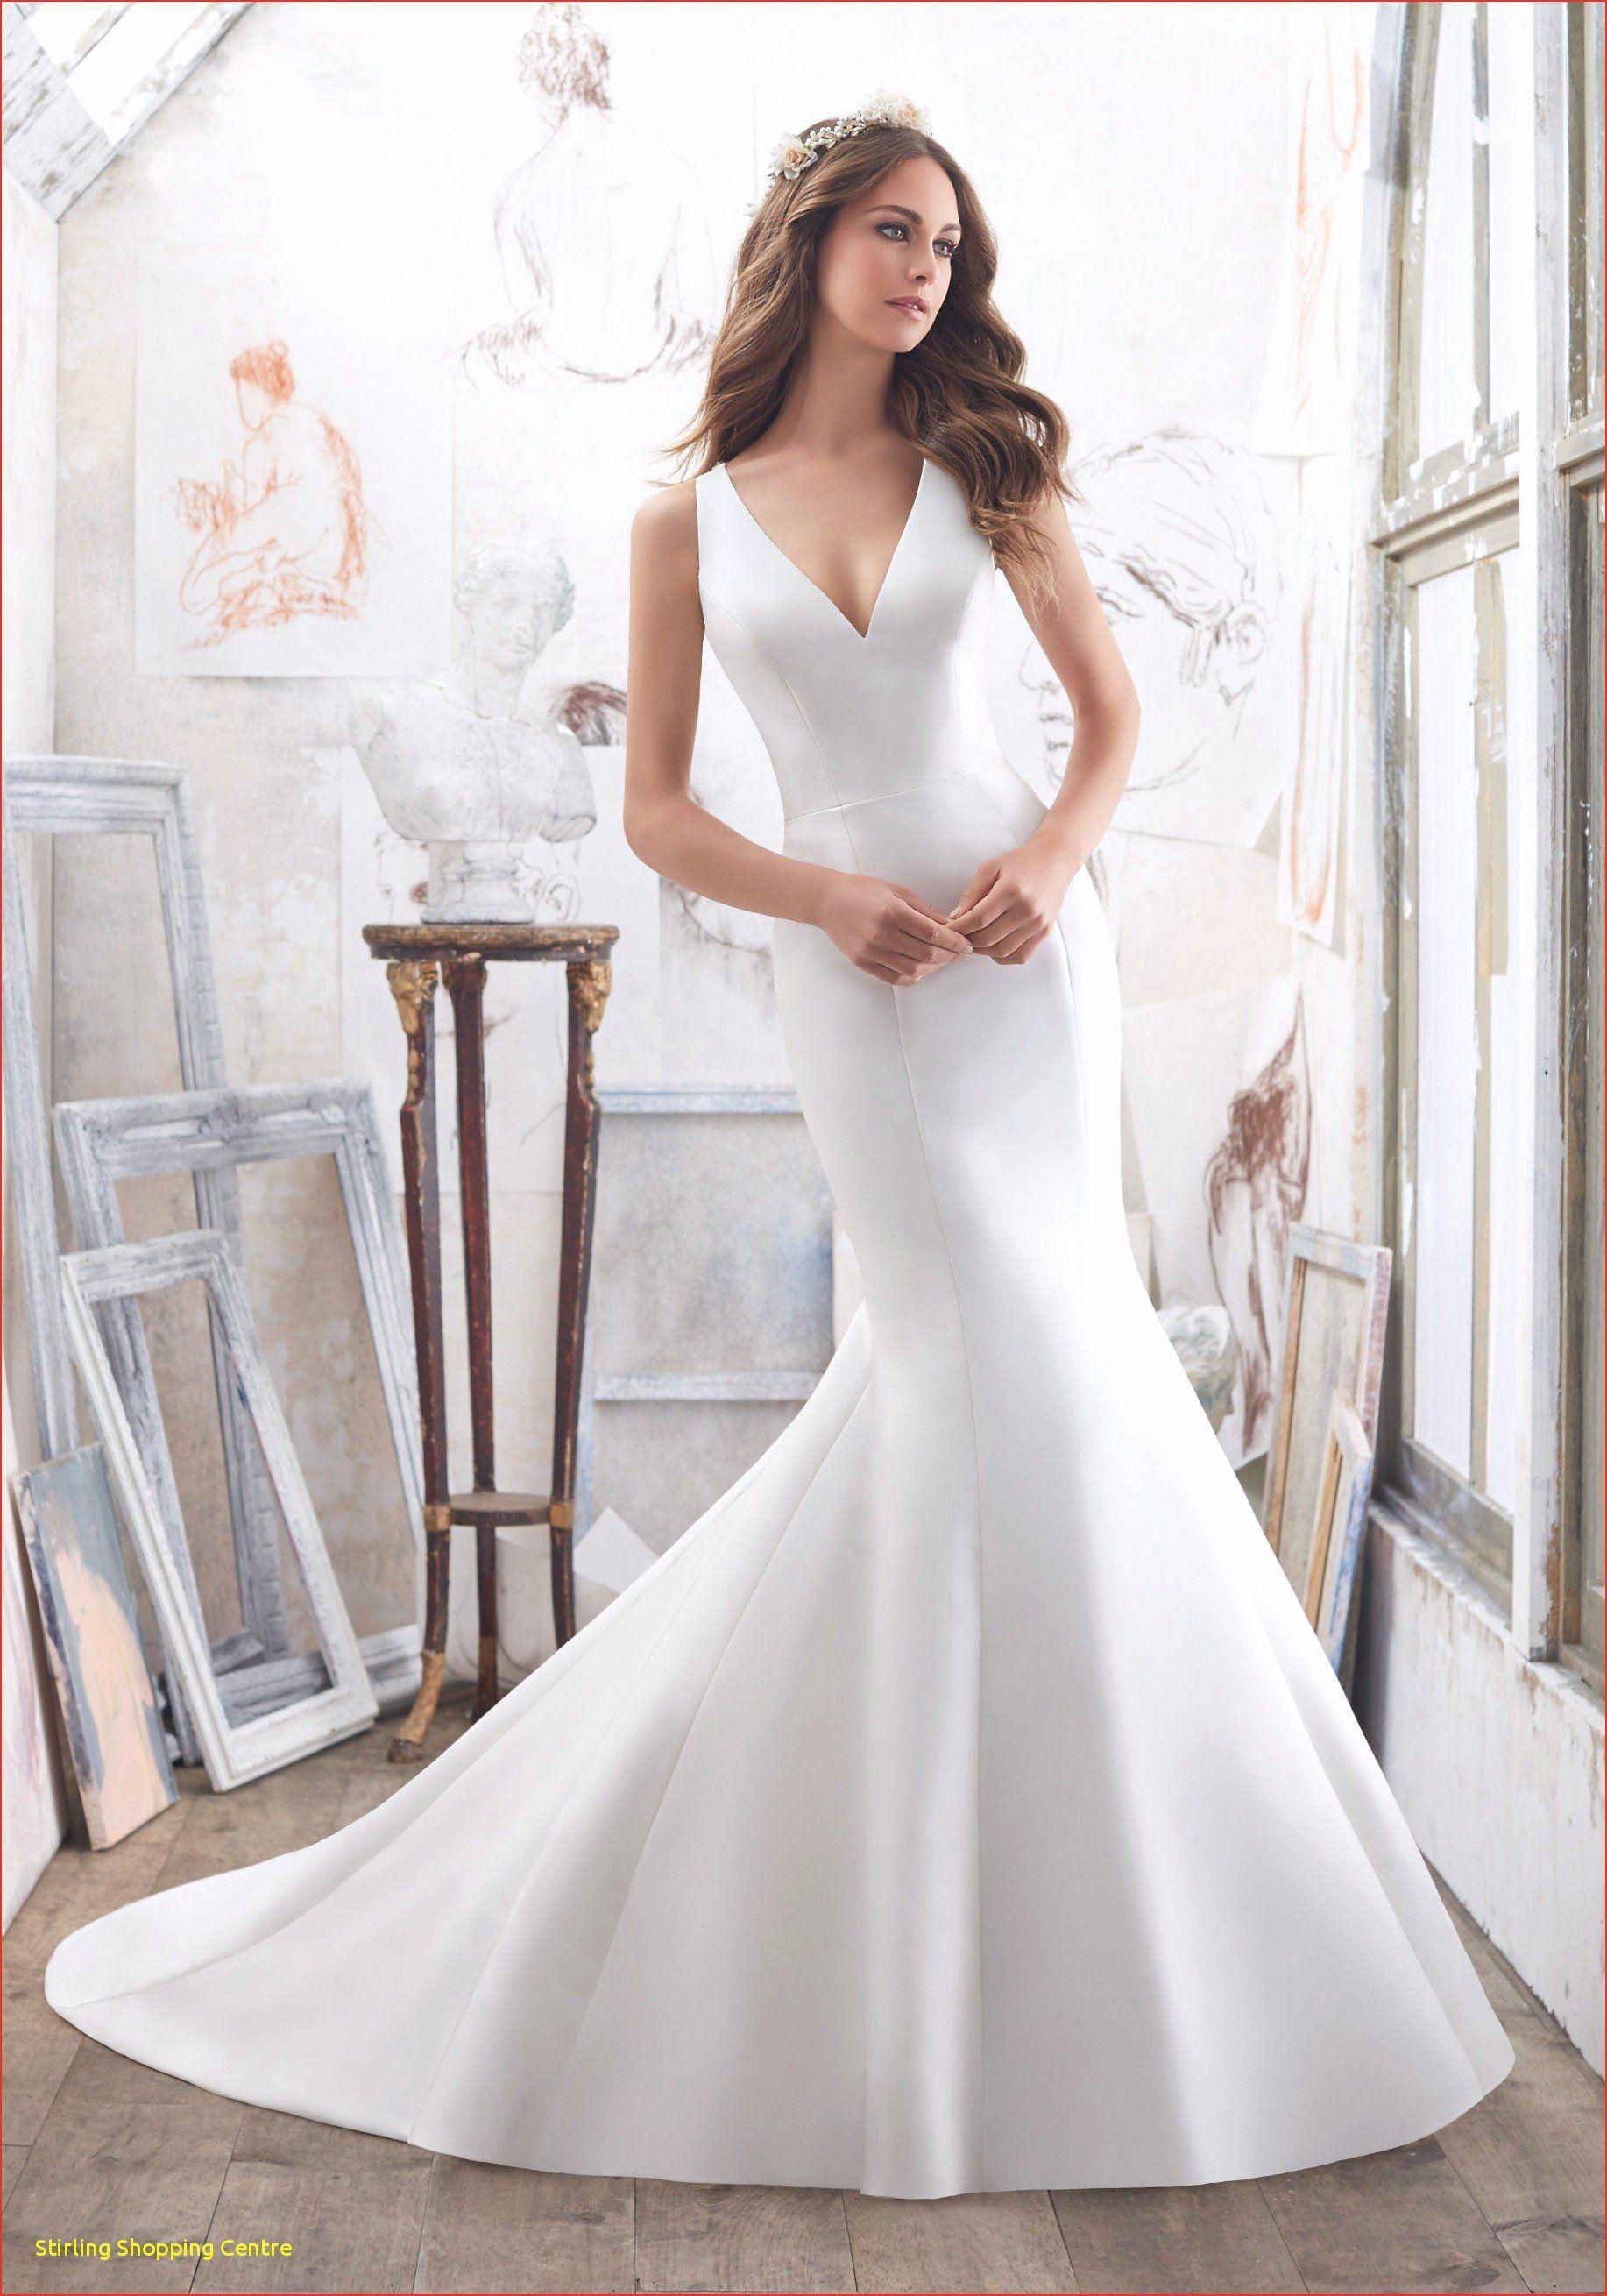 Wedding Dress Design Your Own New Best Aliexpress Wedding Dress In 2020 Mori Lee Wedding Dress Fit And Flare Wedding Dress Wedding Dresses Satin